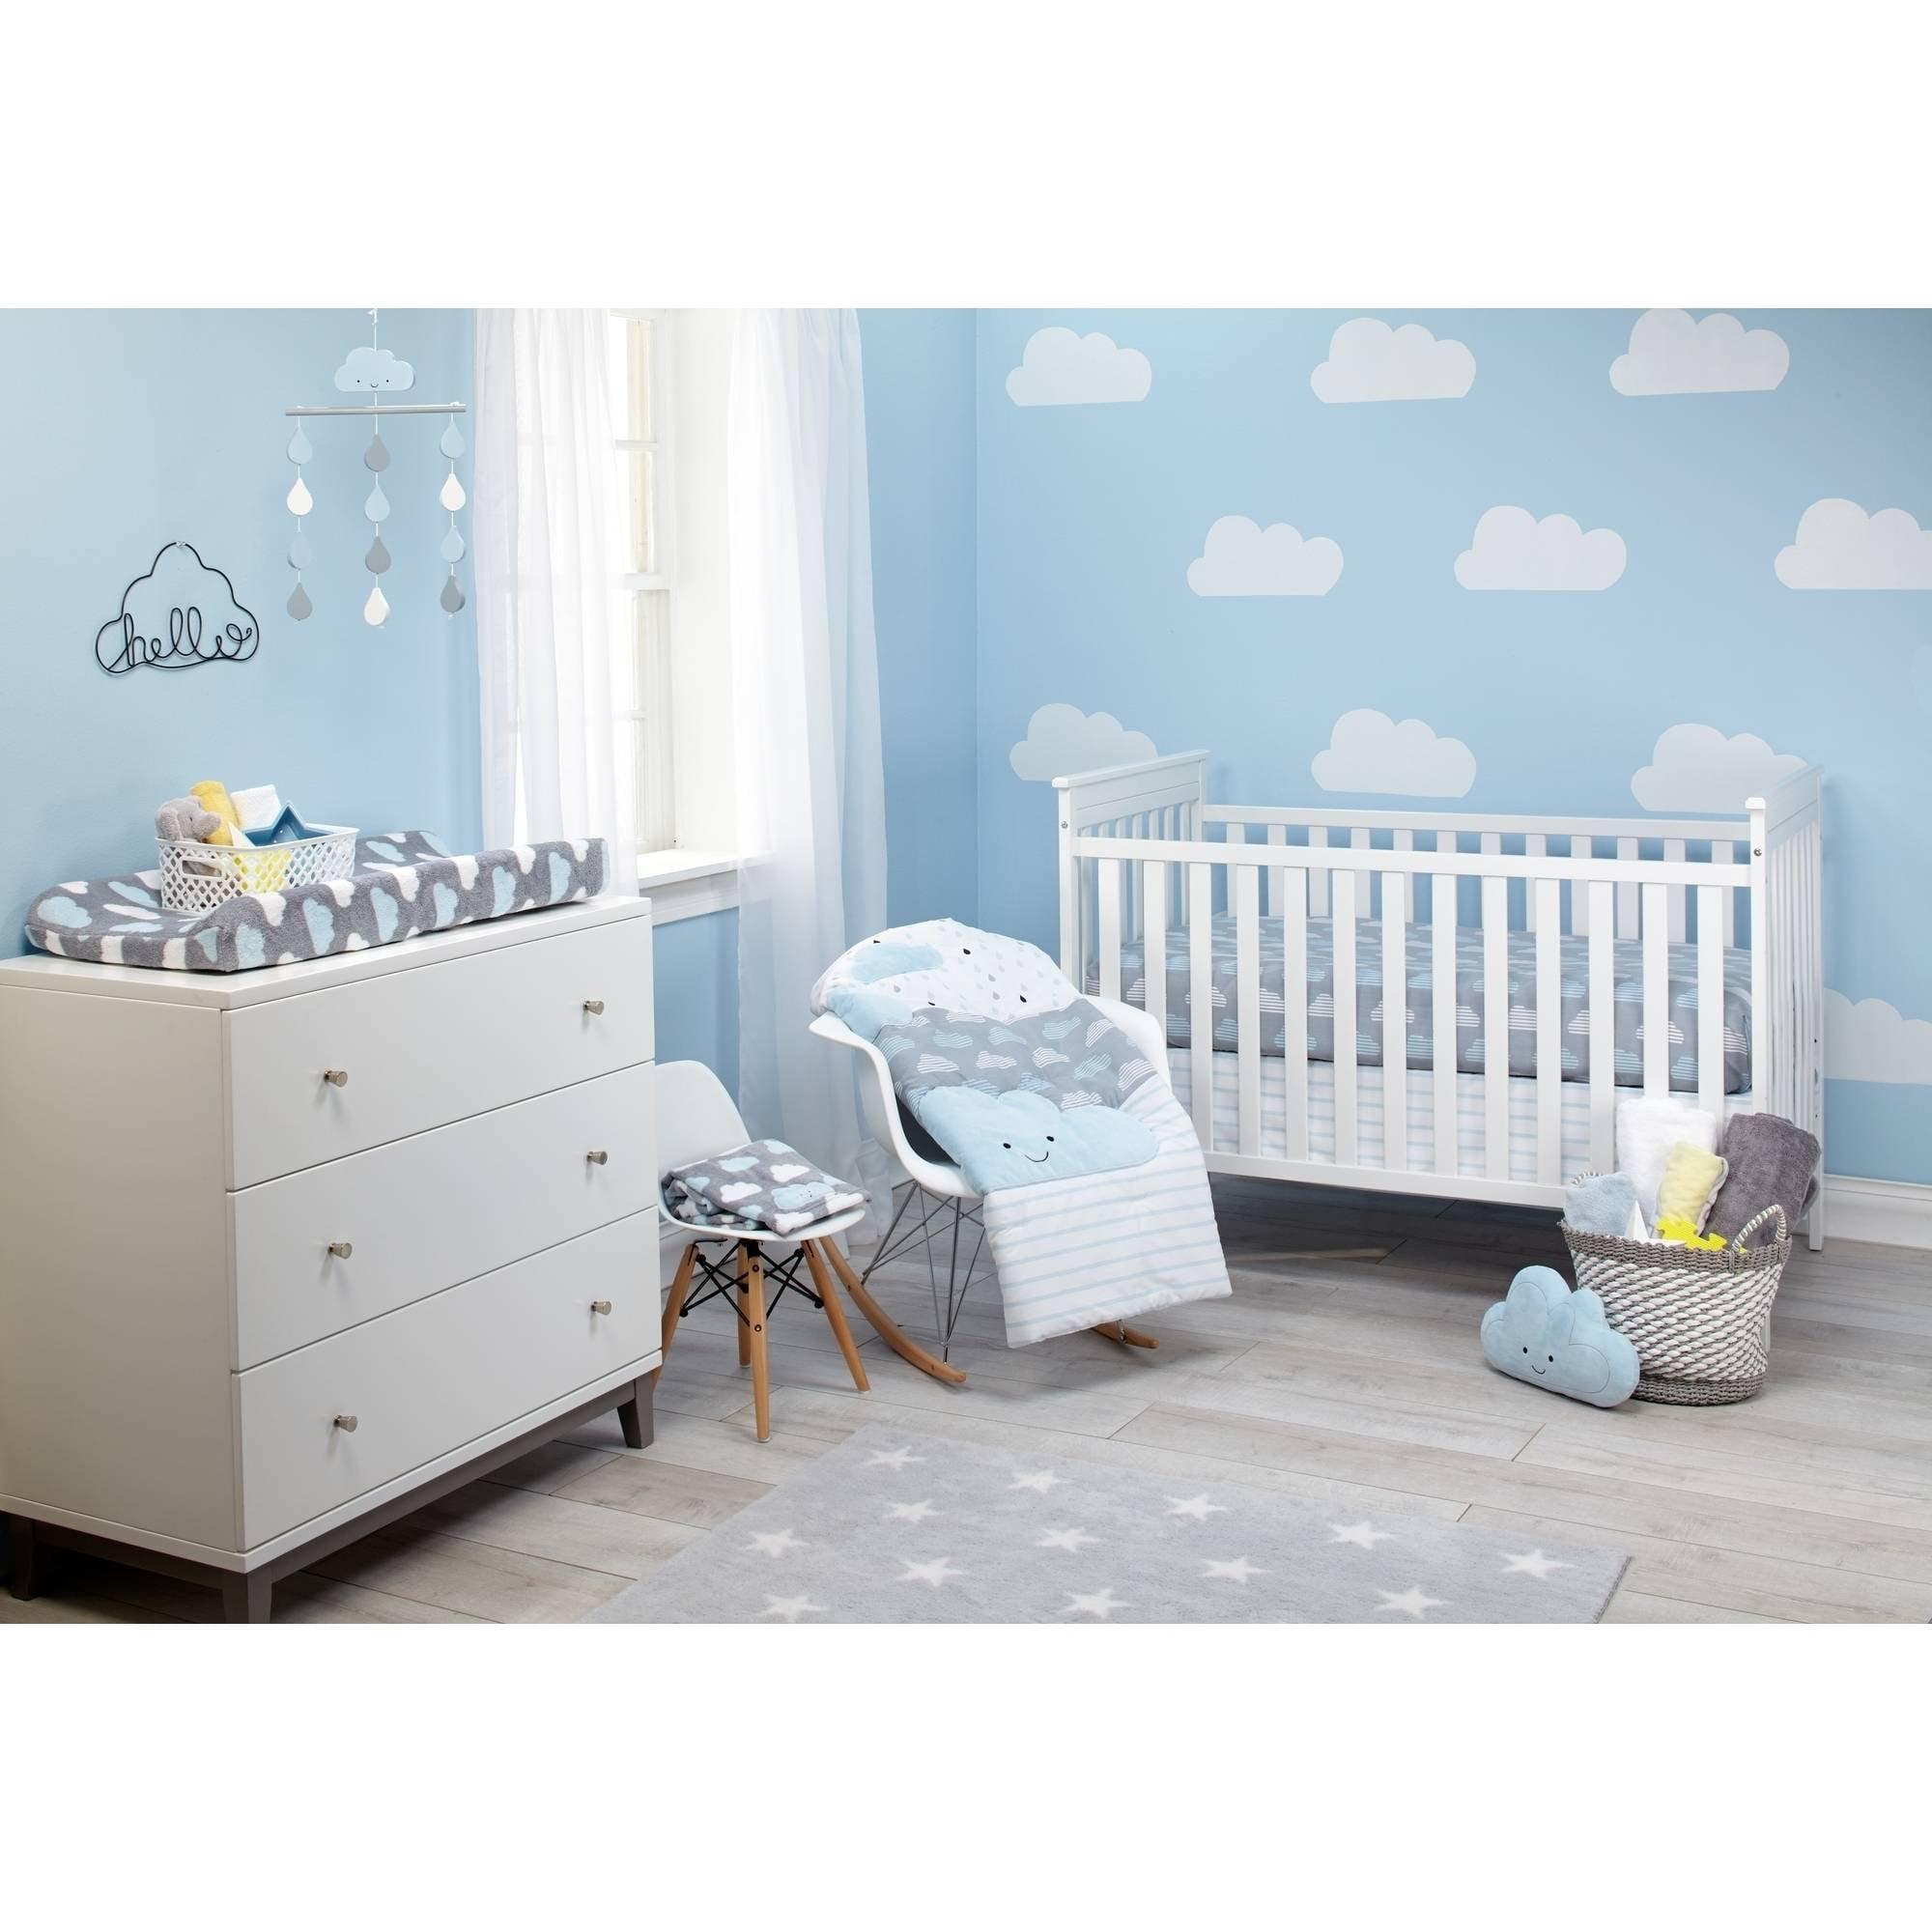 trends roo and top giraffe liz set decor giraffes sets luxury crib nursery navy bedding